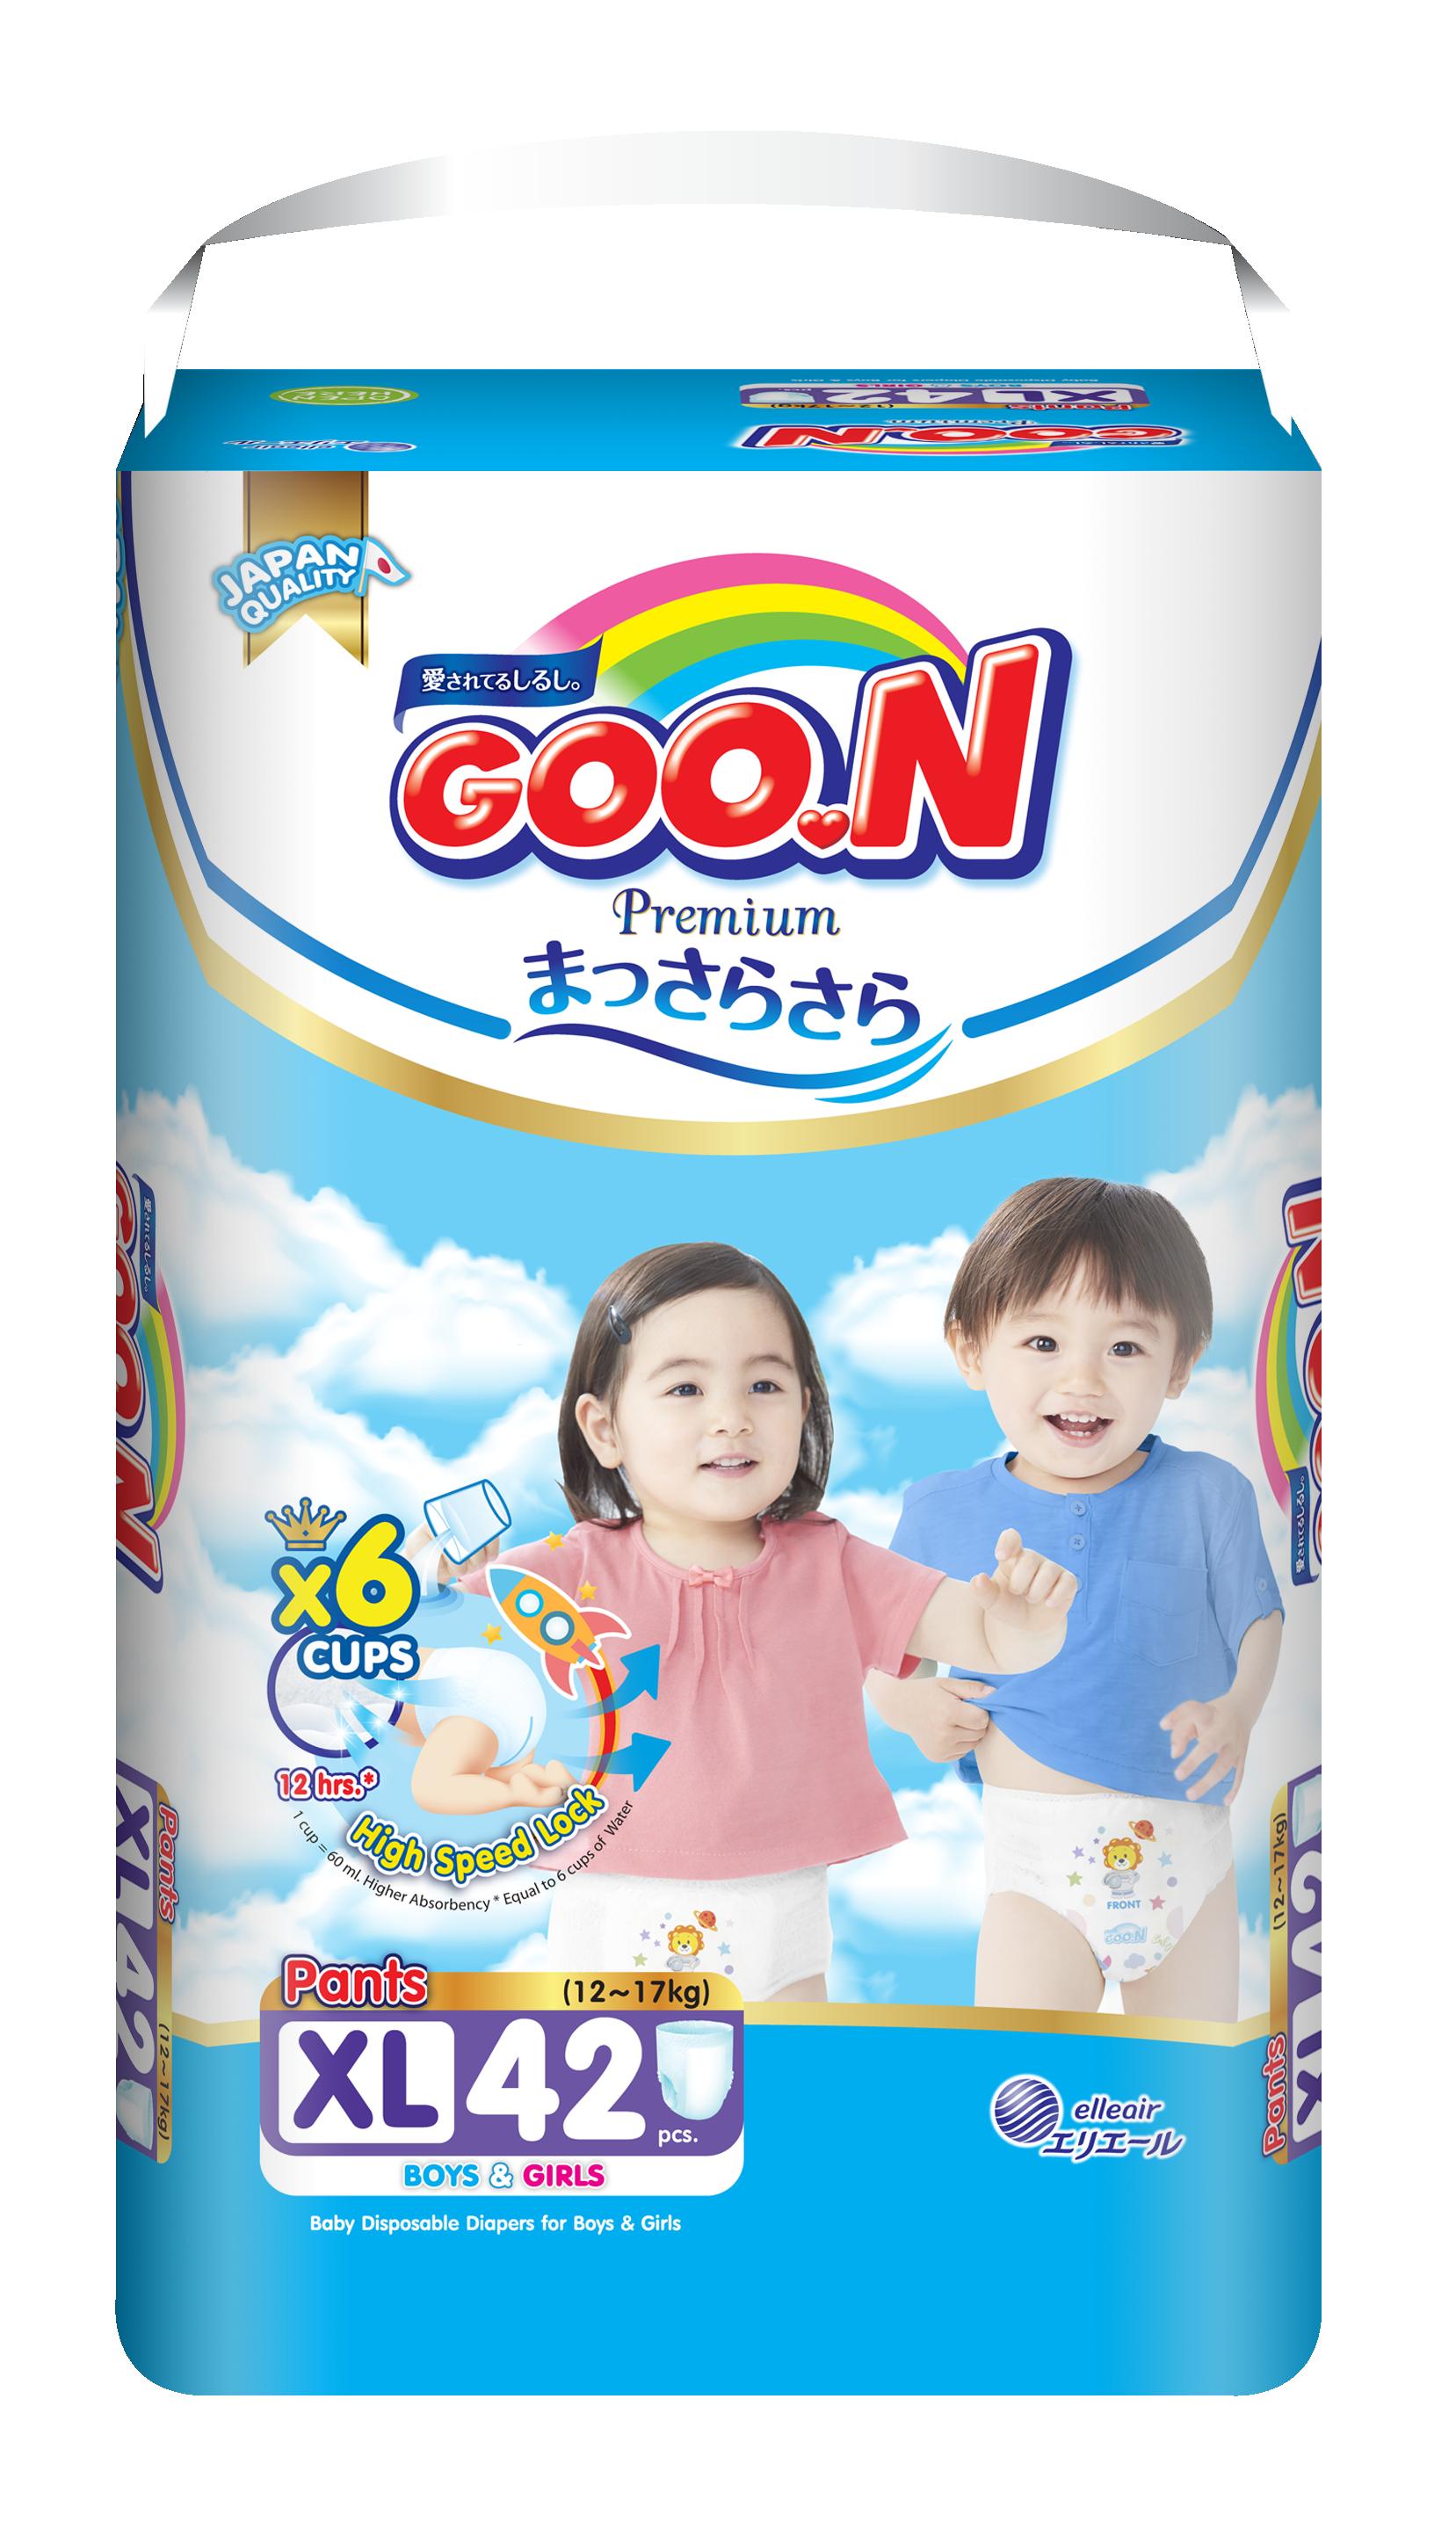 Tã quần Goon Premium size XL 42 miếng